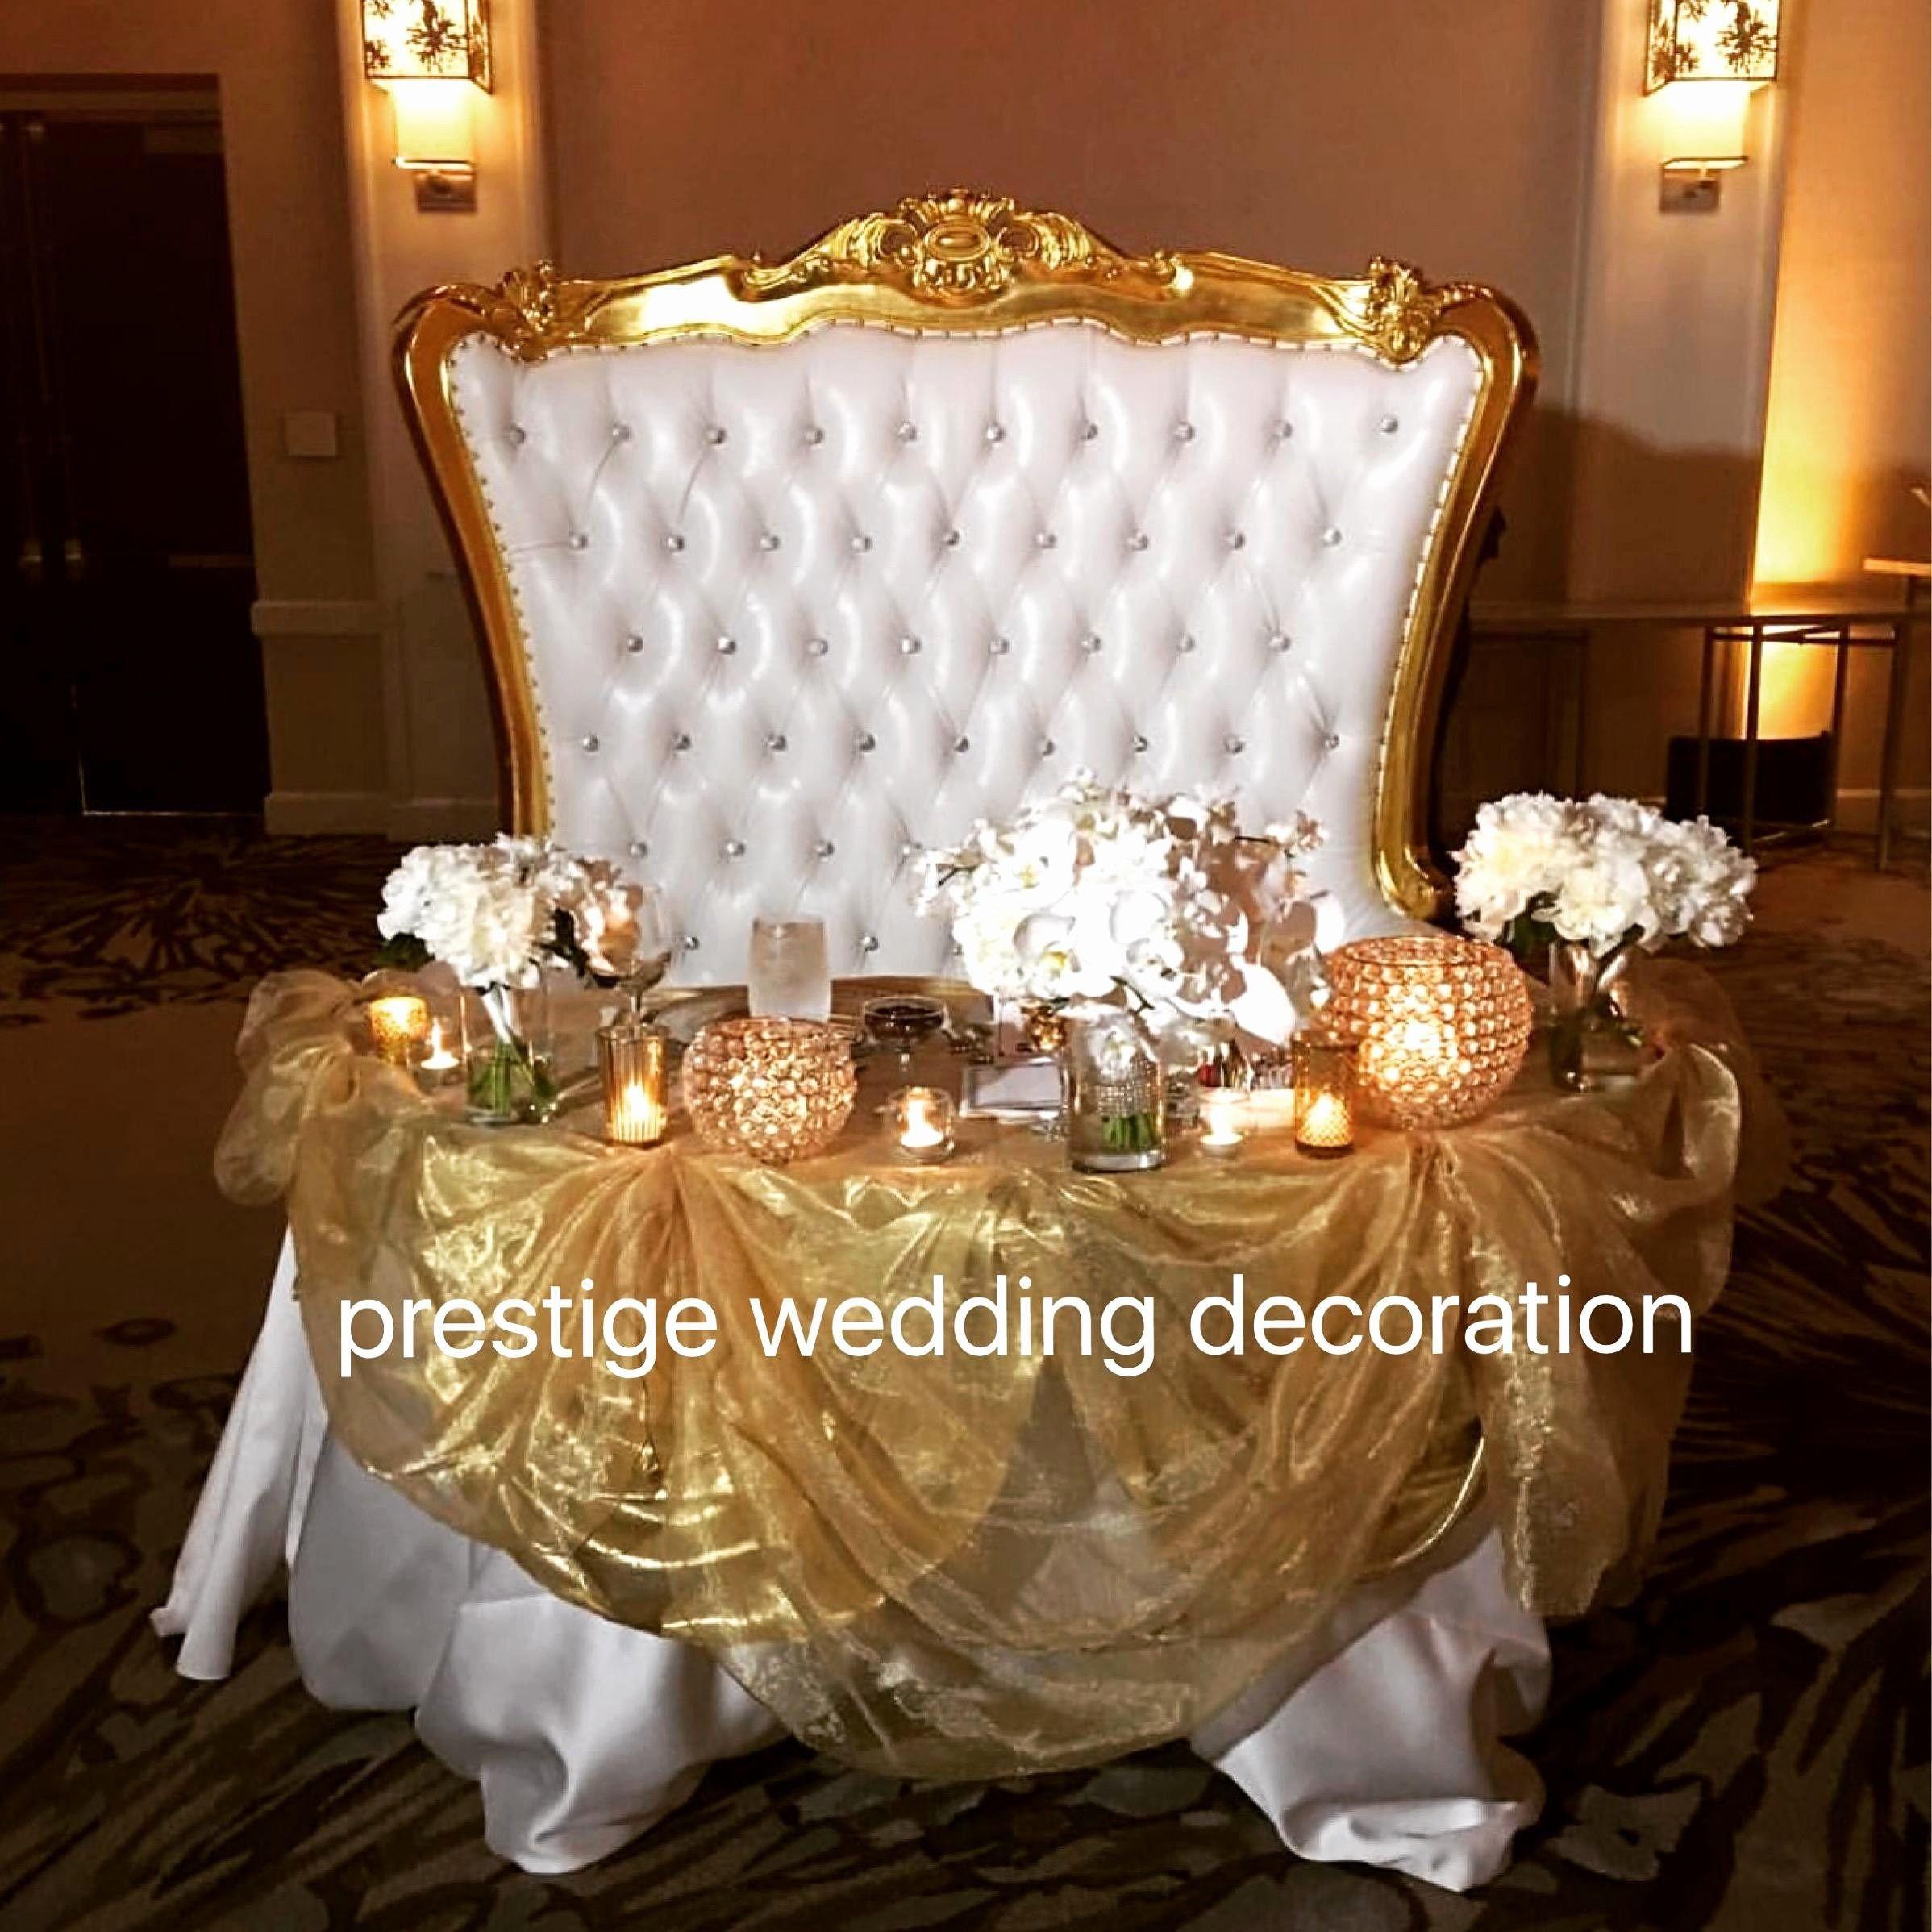 bulk vase filler gems of 30 pearl vase fillers the weekly world intended for wedding entrance ideas elegant wedding decor by q events wedding